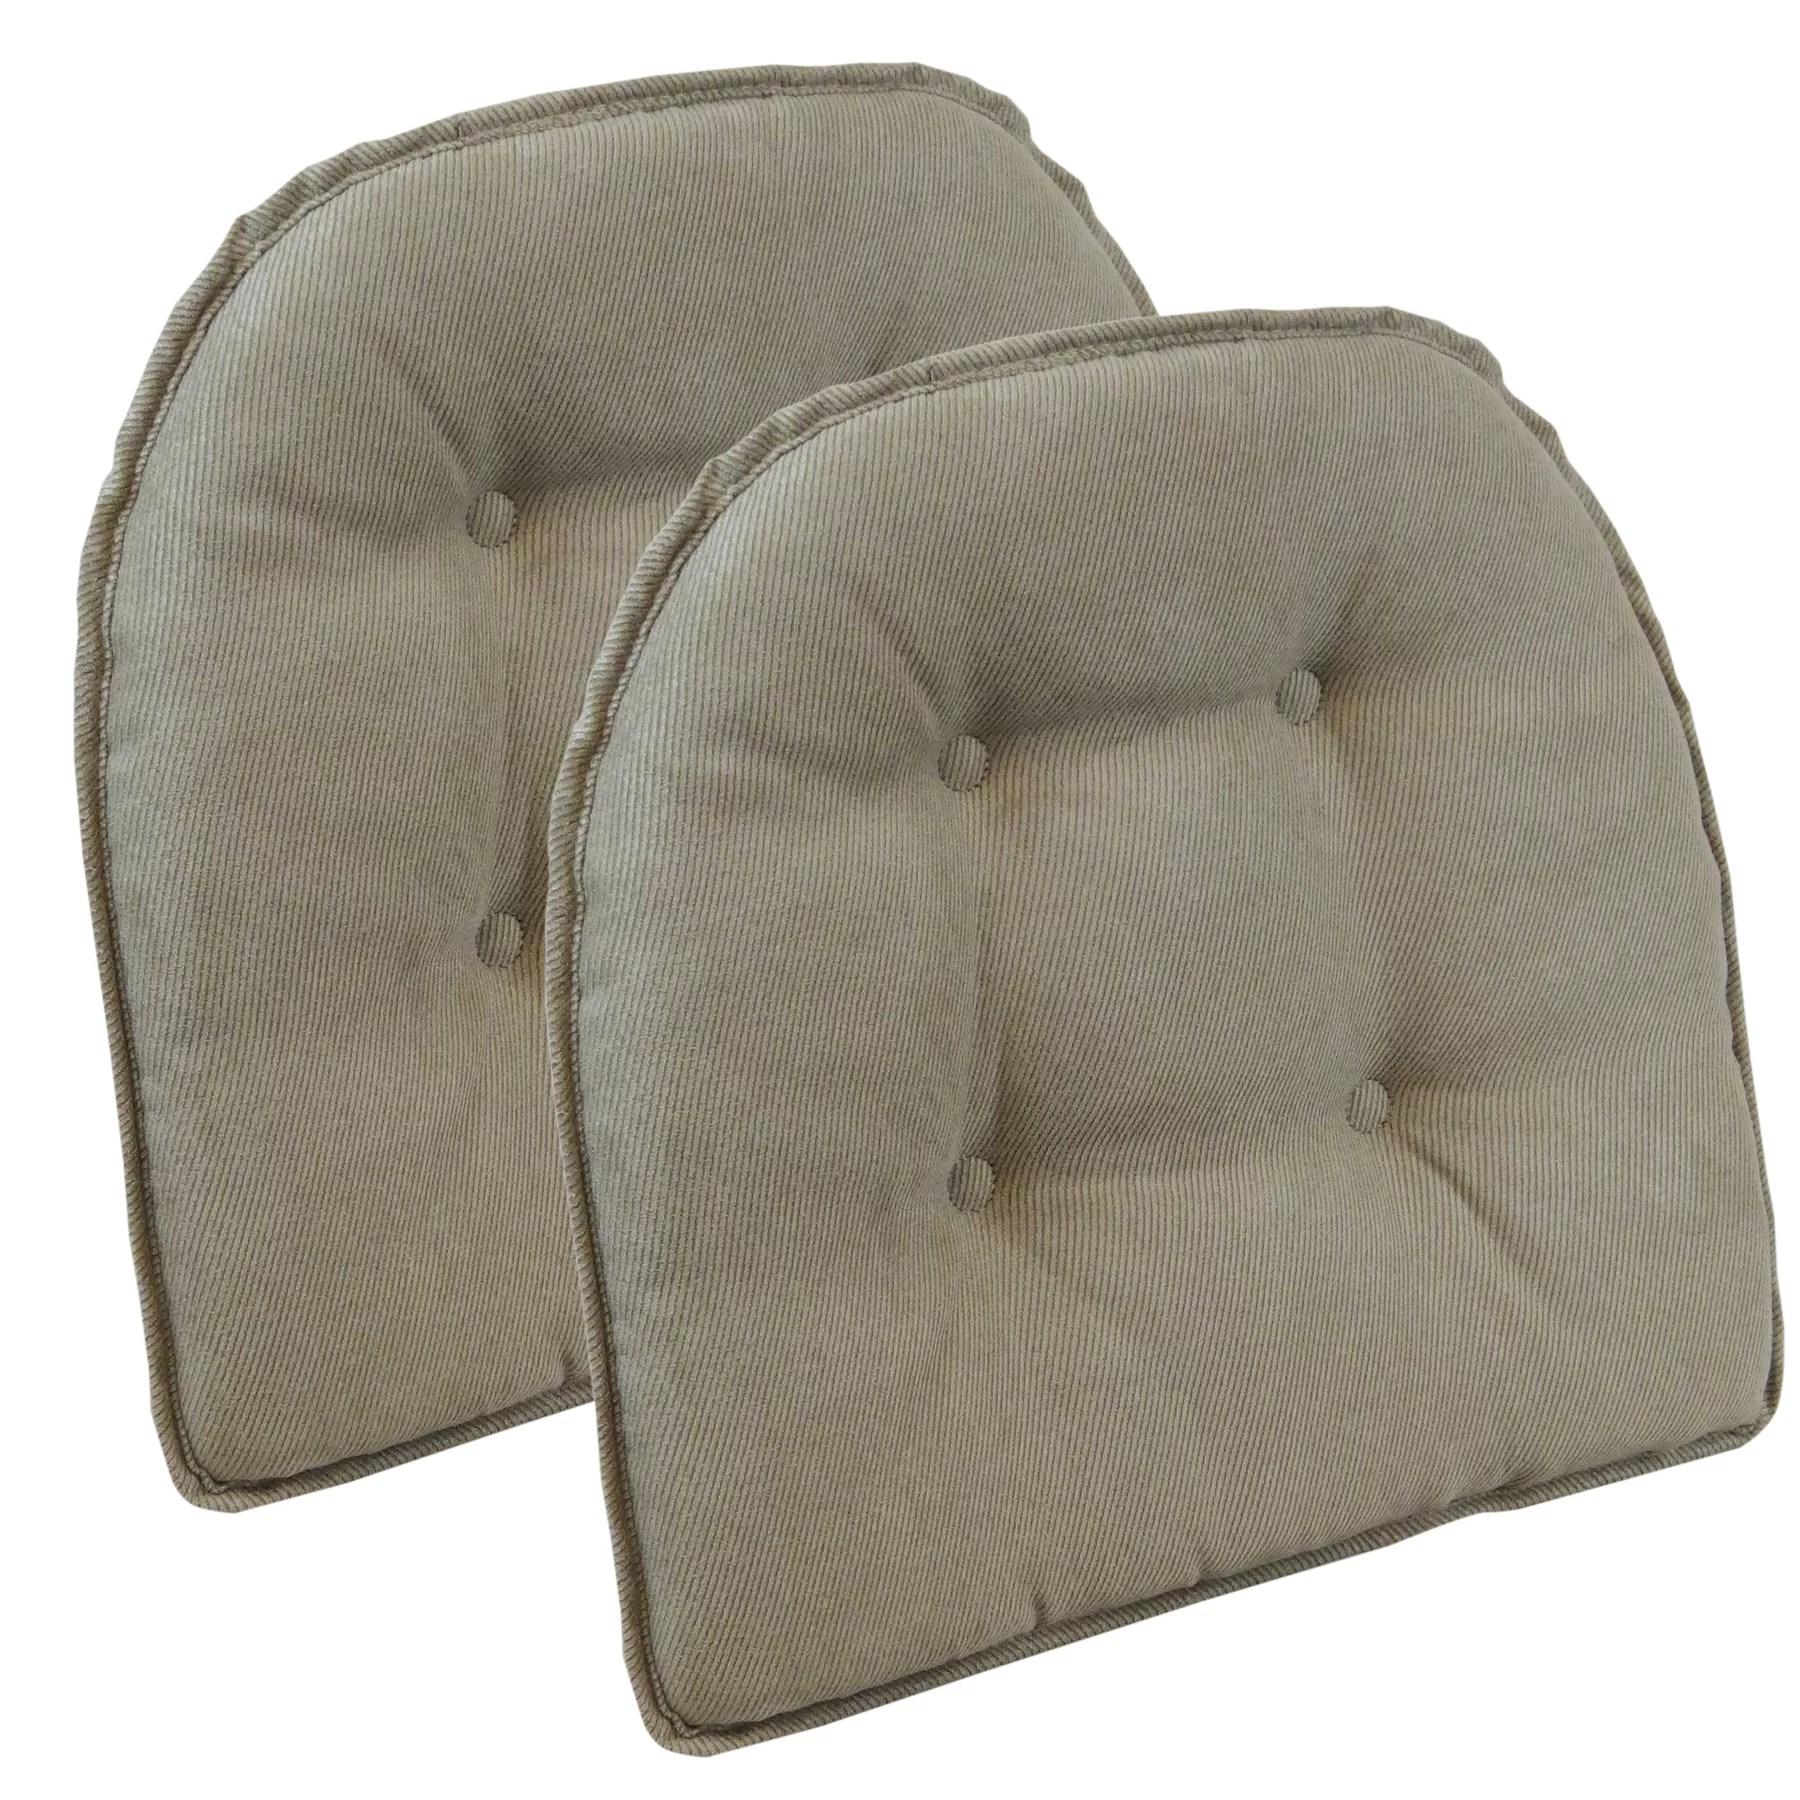 dining chair cushions non slip office floor protector klear vu twillo cushion and reviews wayfair